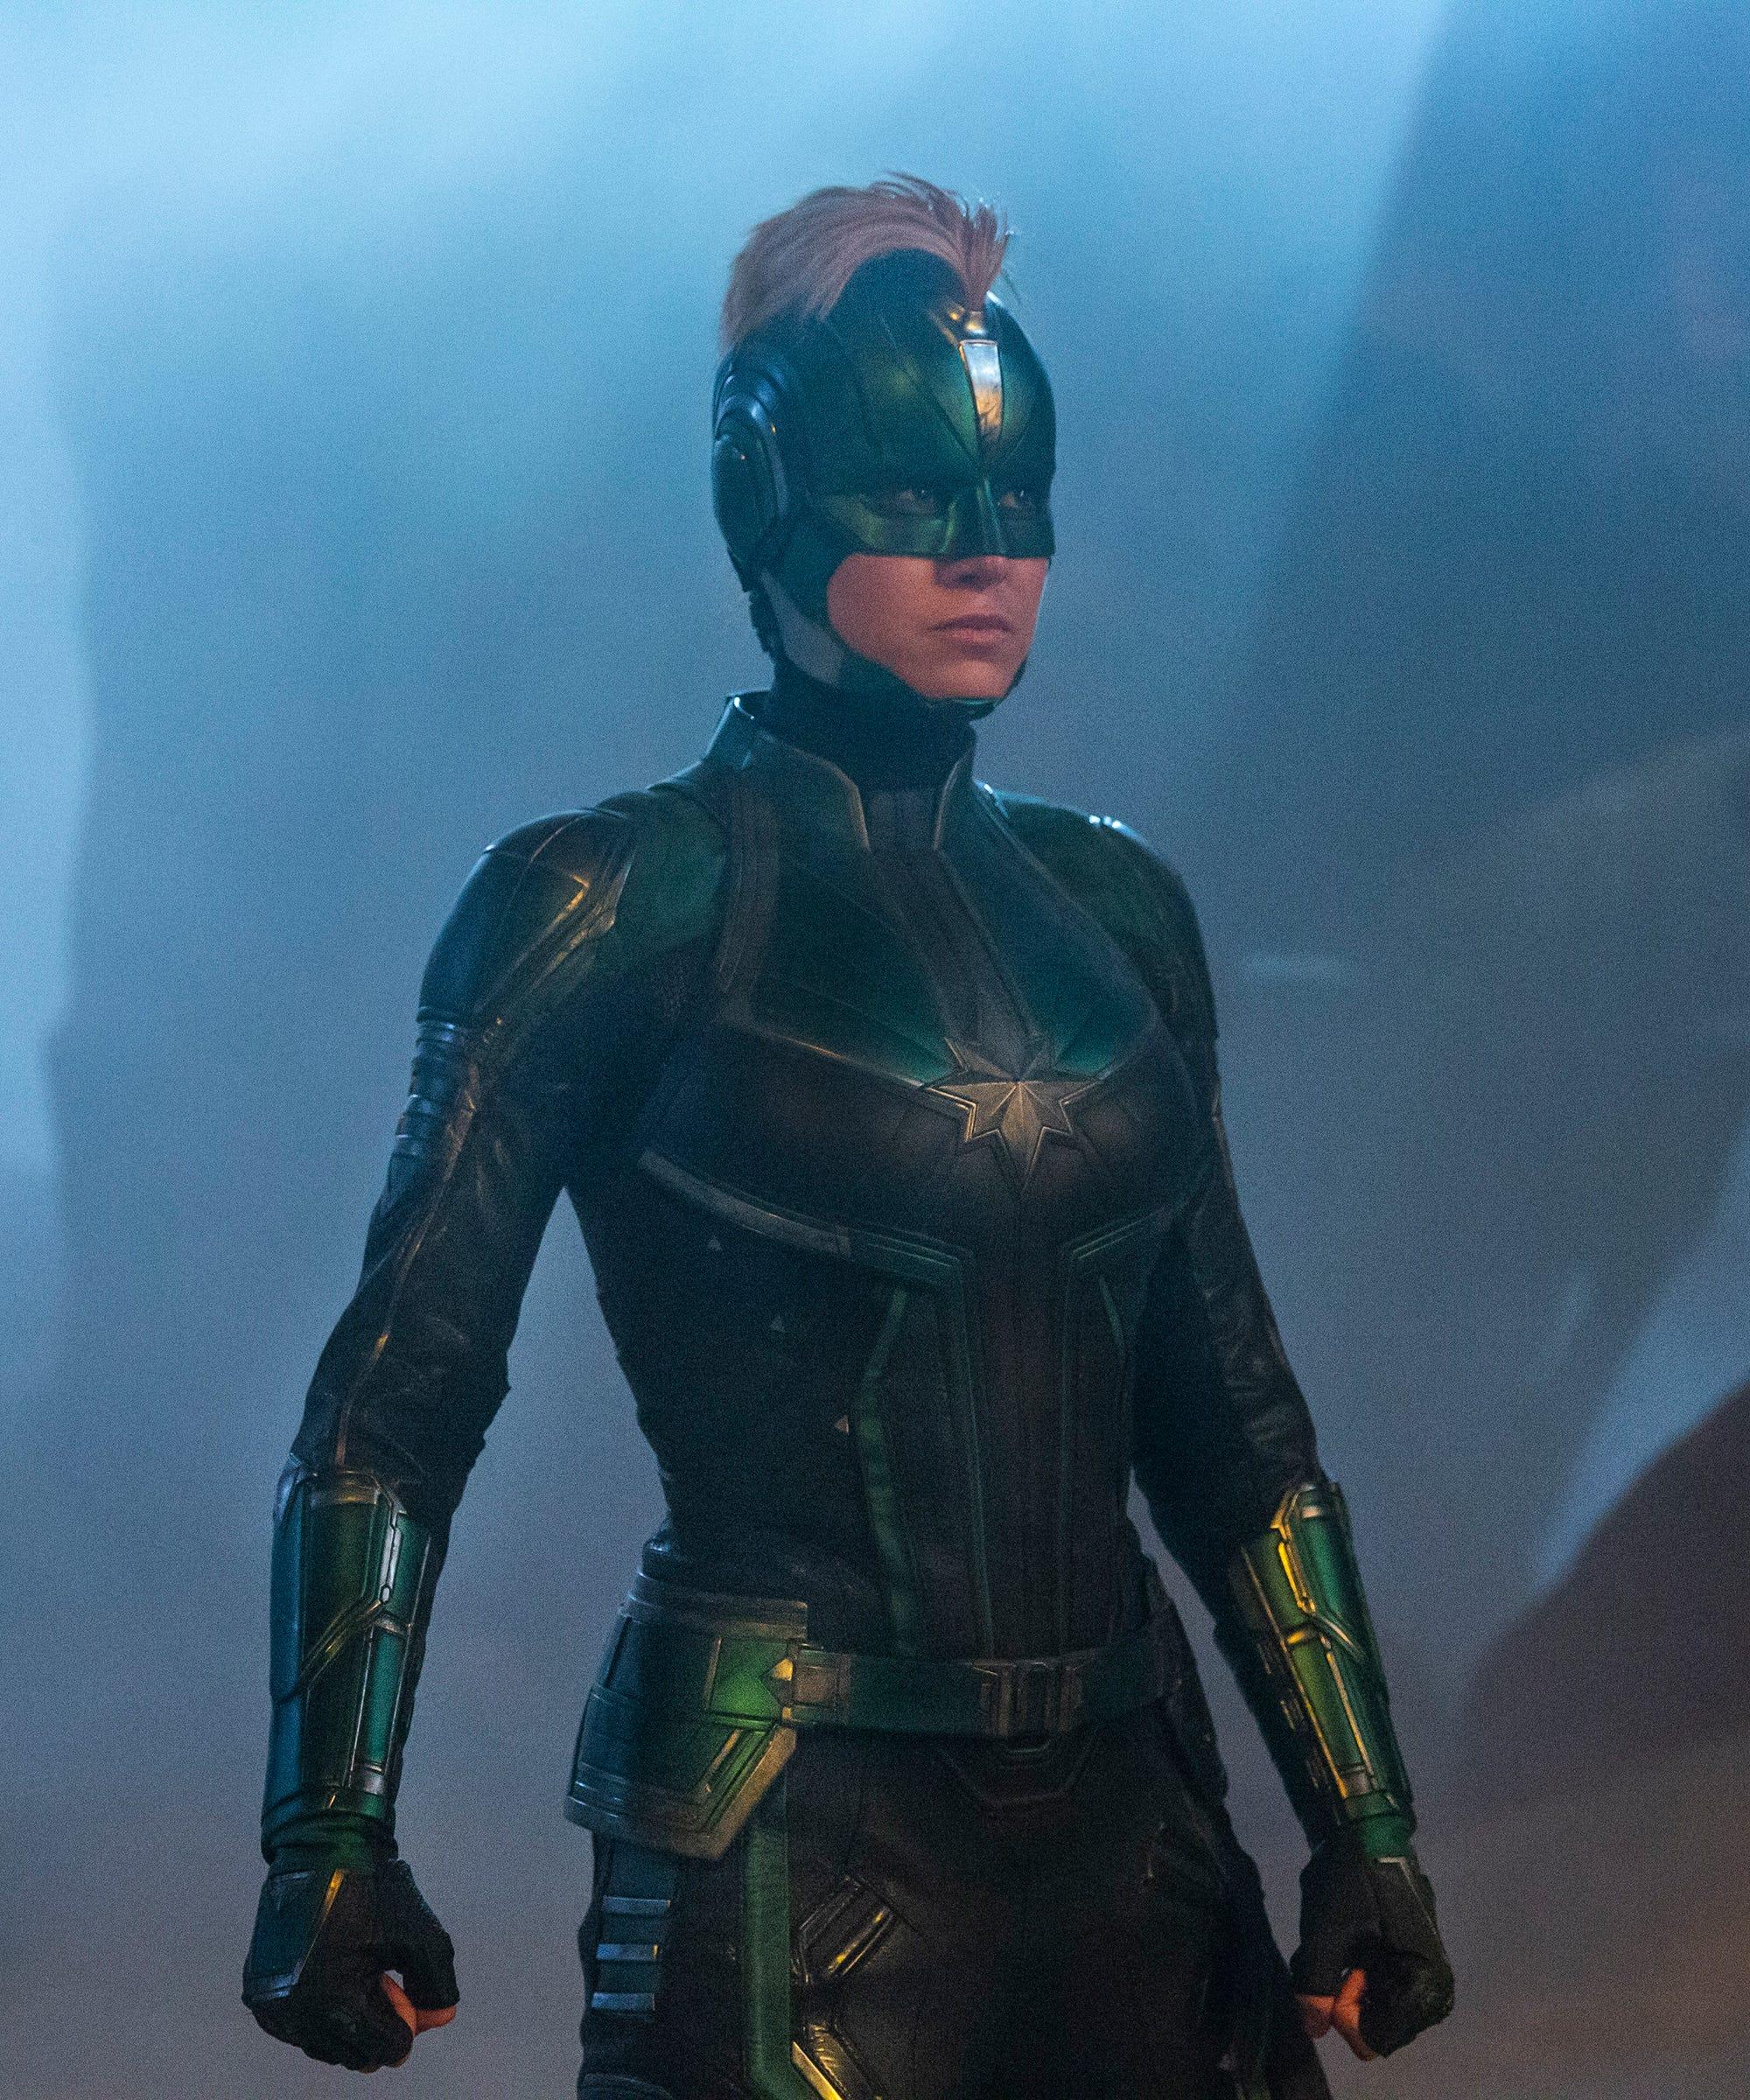 Brie Larson Retro Hair Transformation In Captain Marvel